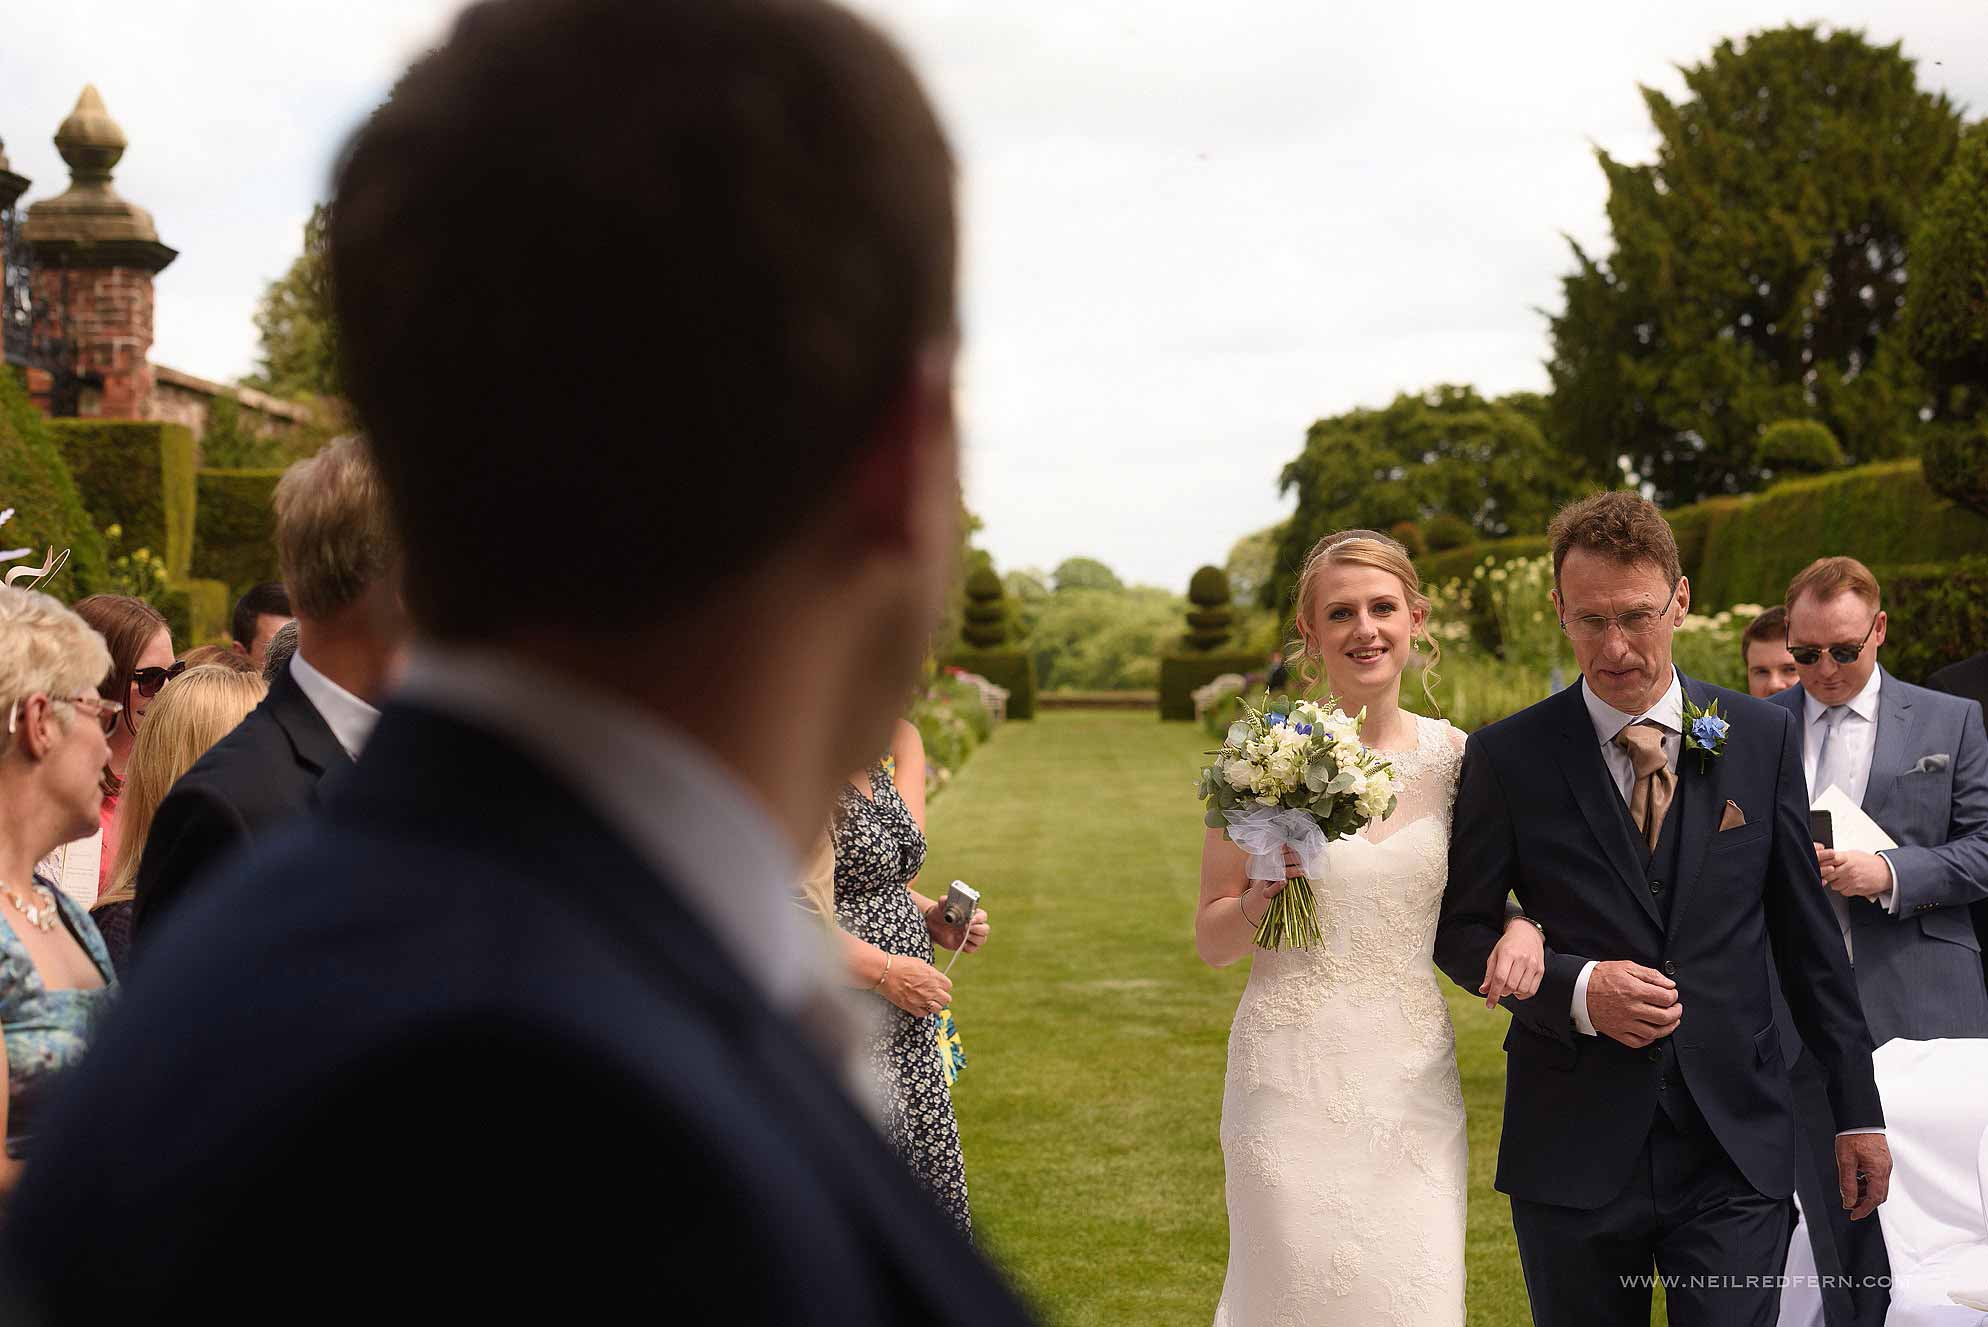 outdoor-wedding-ceremony-in-cheshire-2